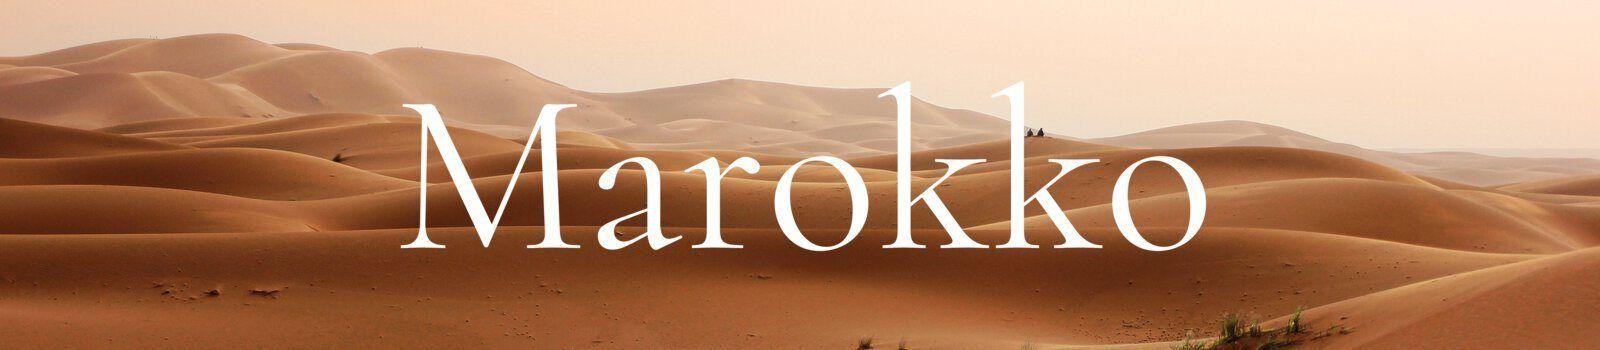 Marokko Banner